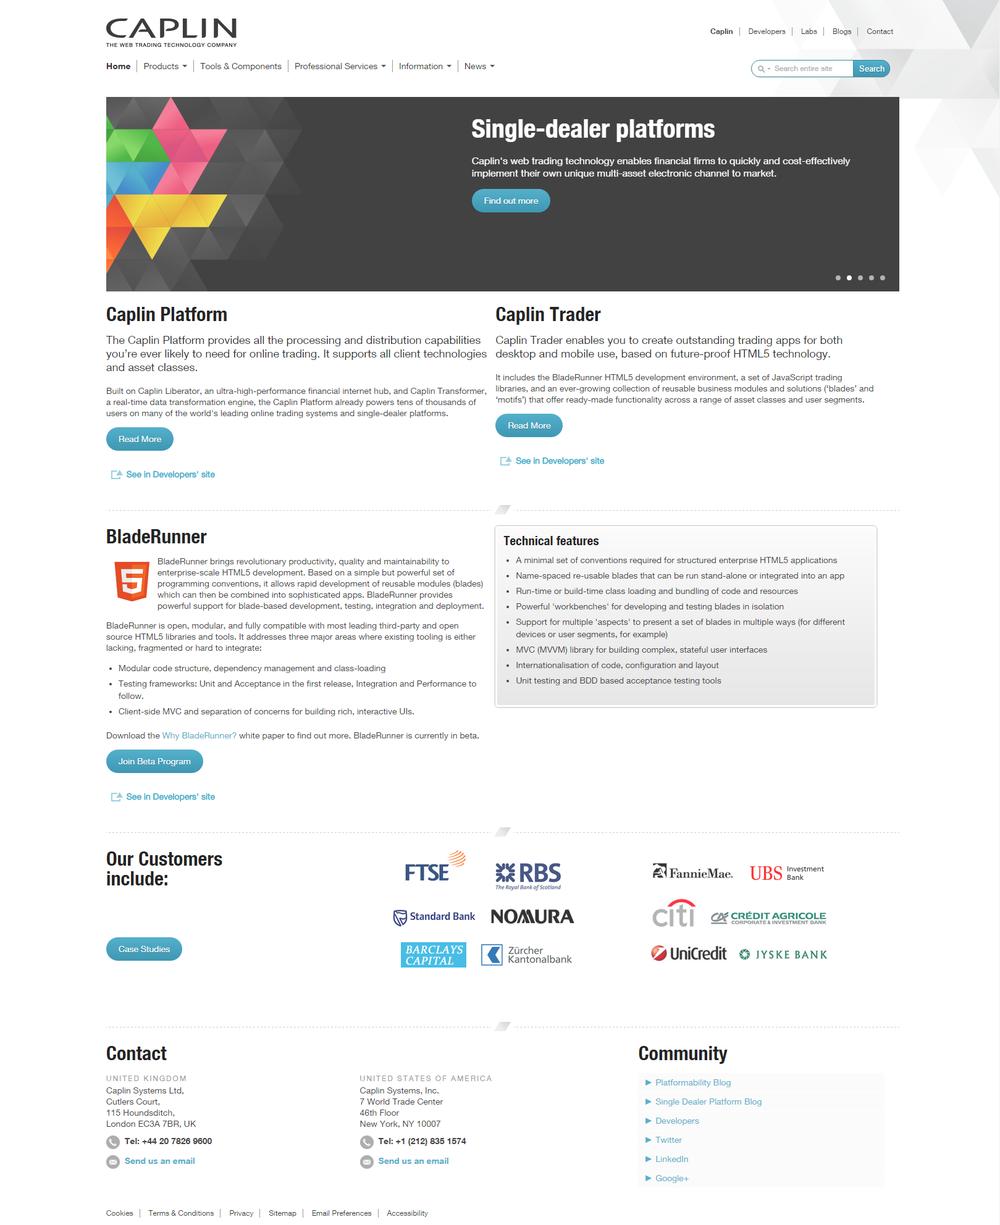 The Caplin homepage in 2013